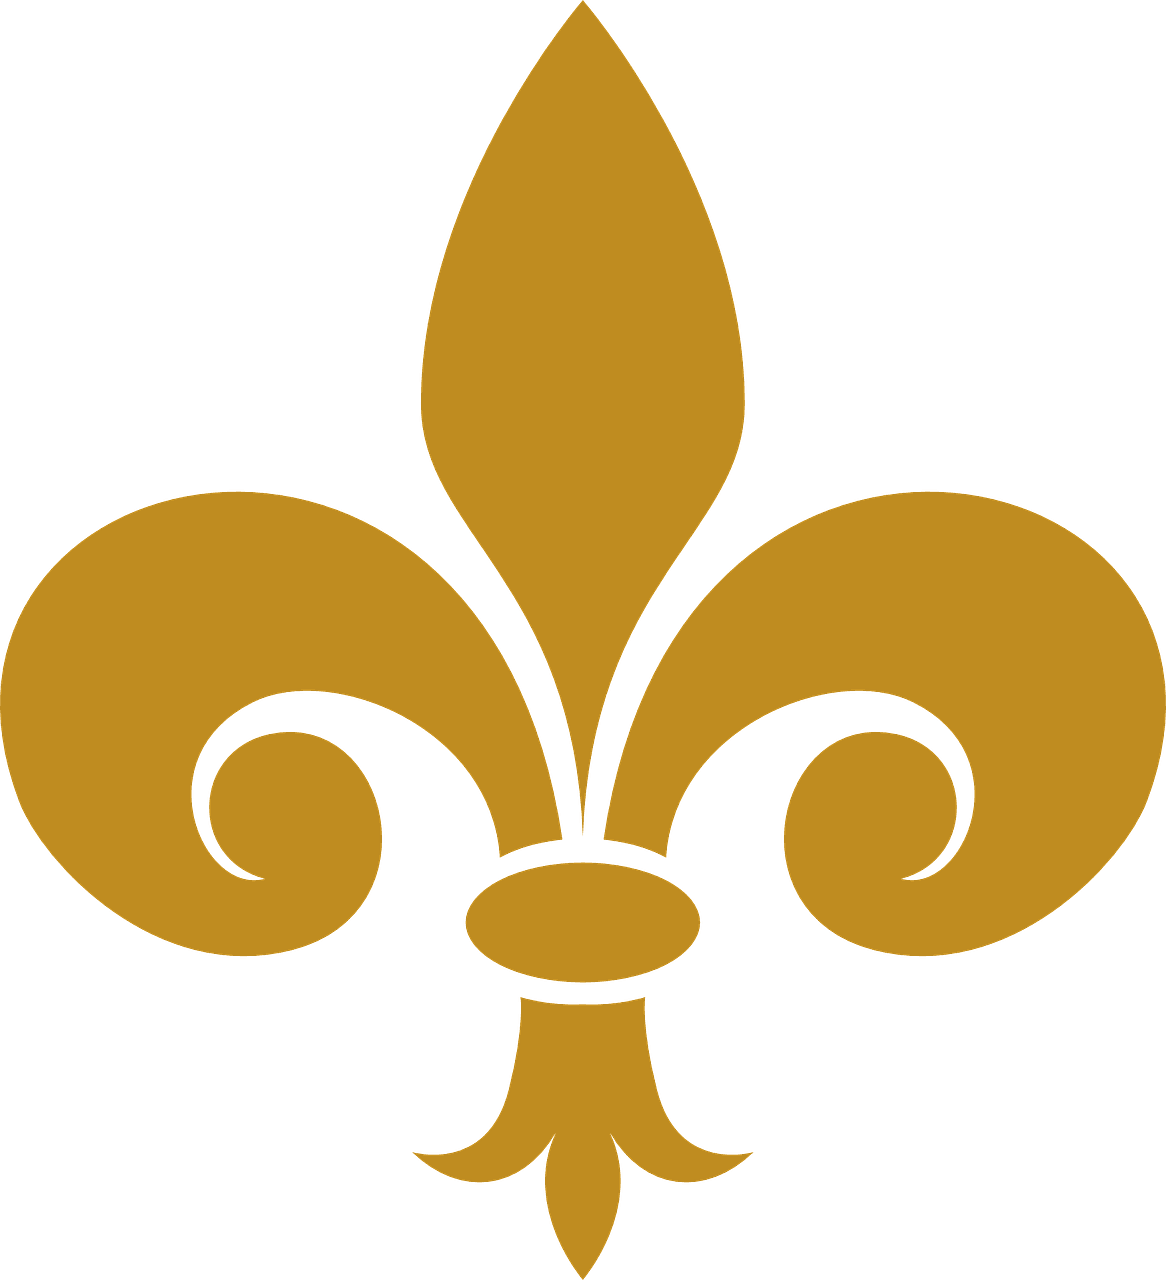 what is the fleur de lis symbol and